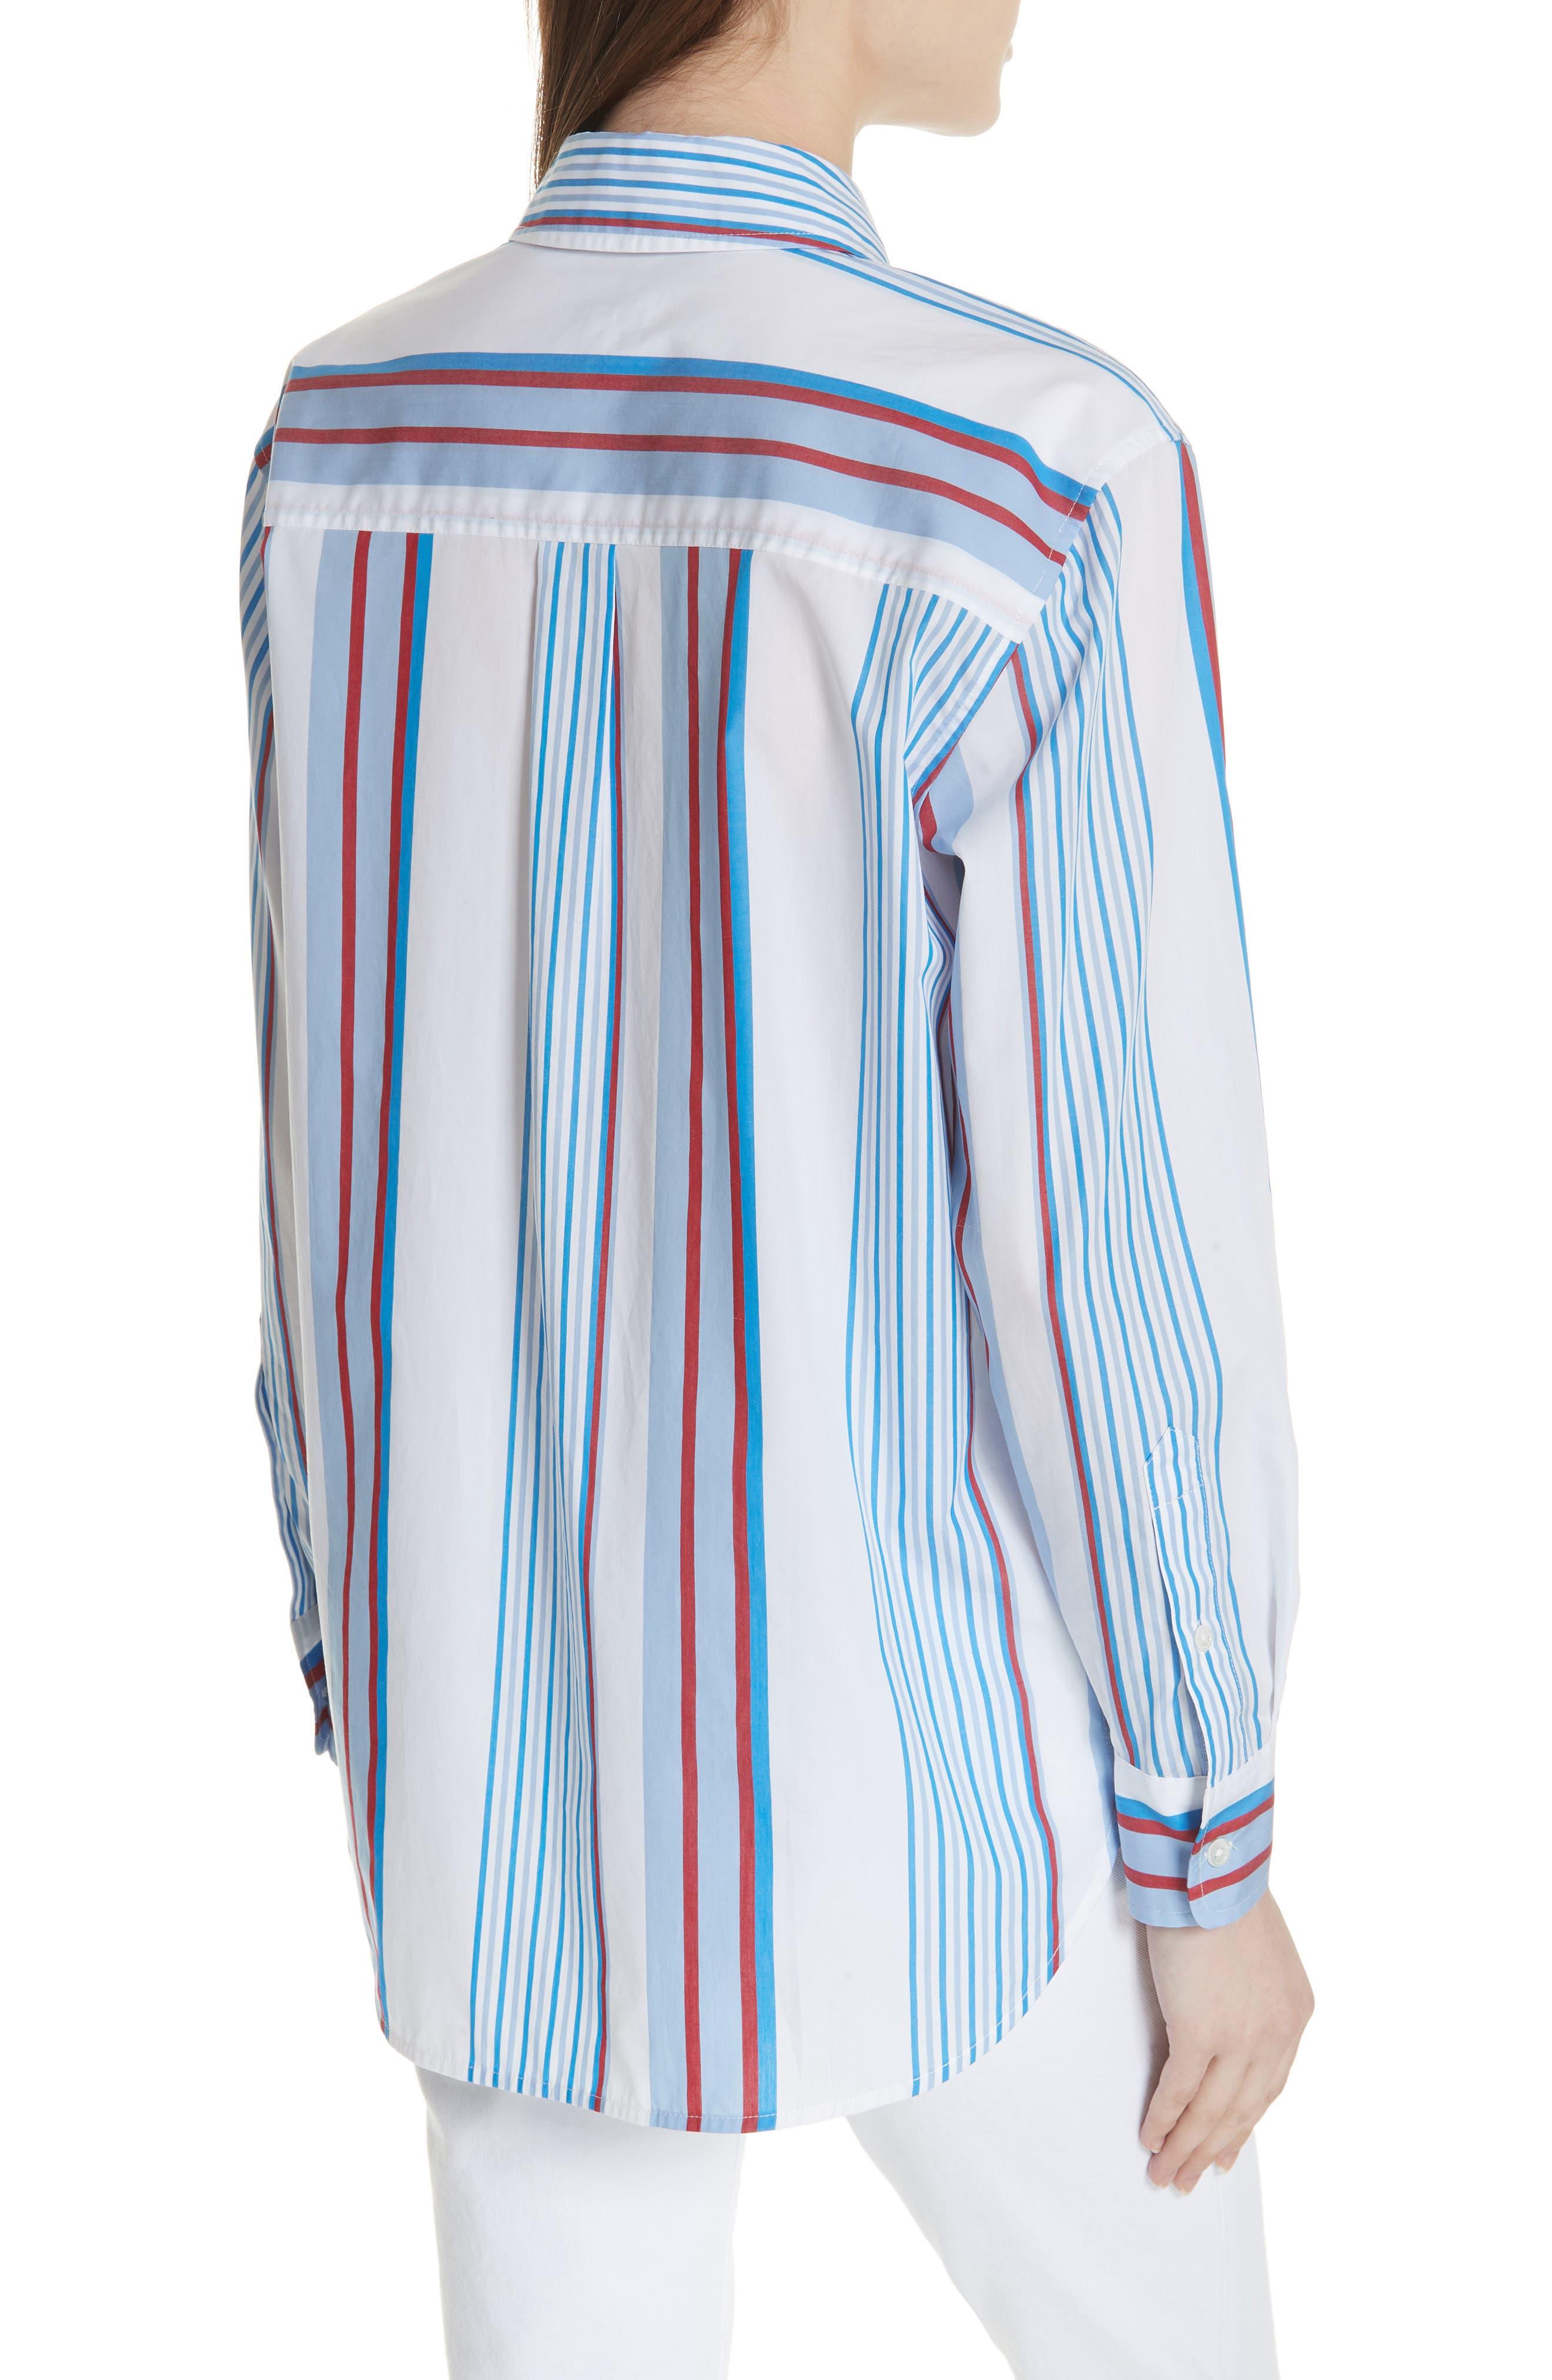 Margaux Stripe Shirt,                             Alternate thumbnail 2, color,                             BLUE WHITE MULTI